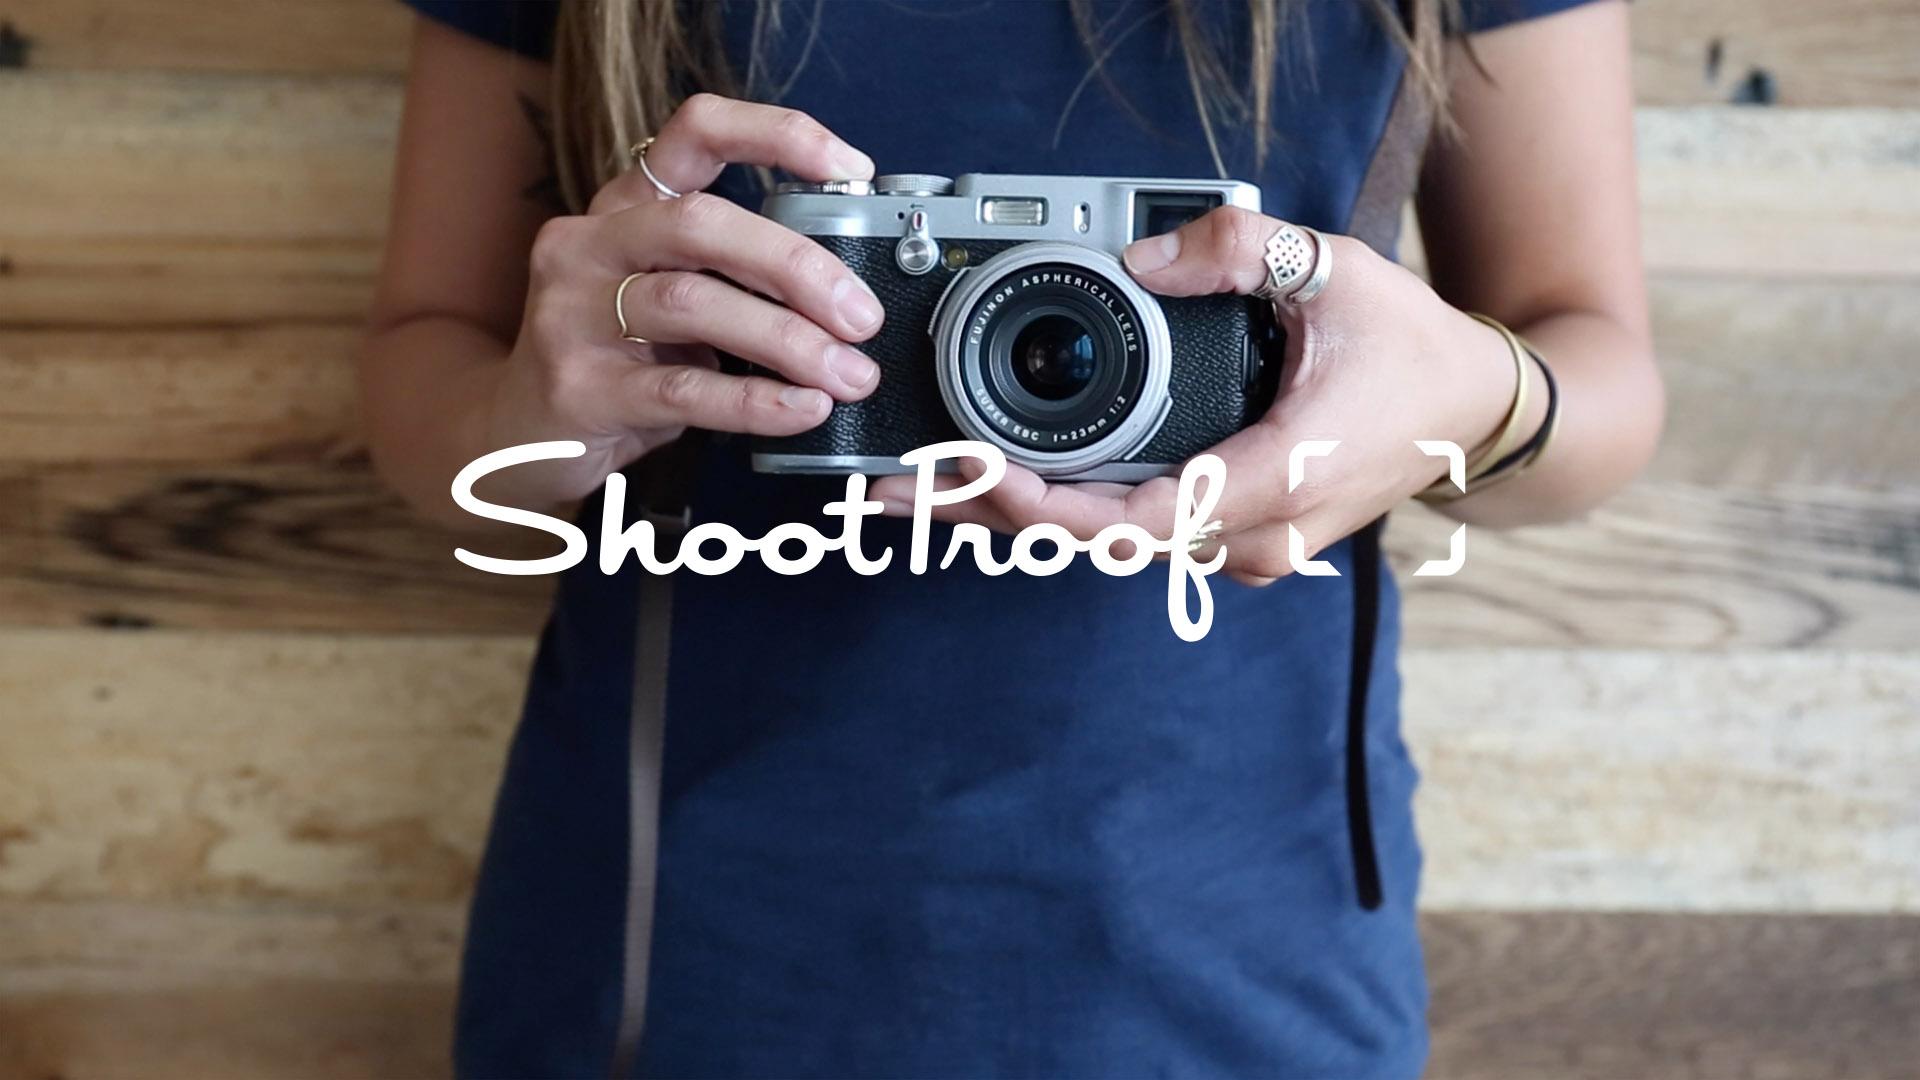 shootproof_russell-shaw_art-direction.jpg